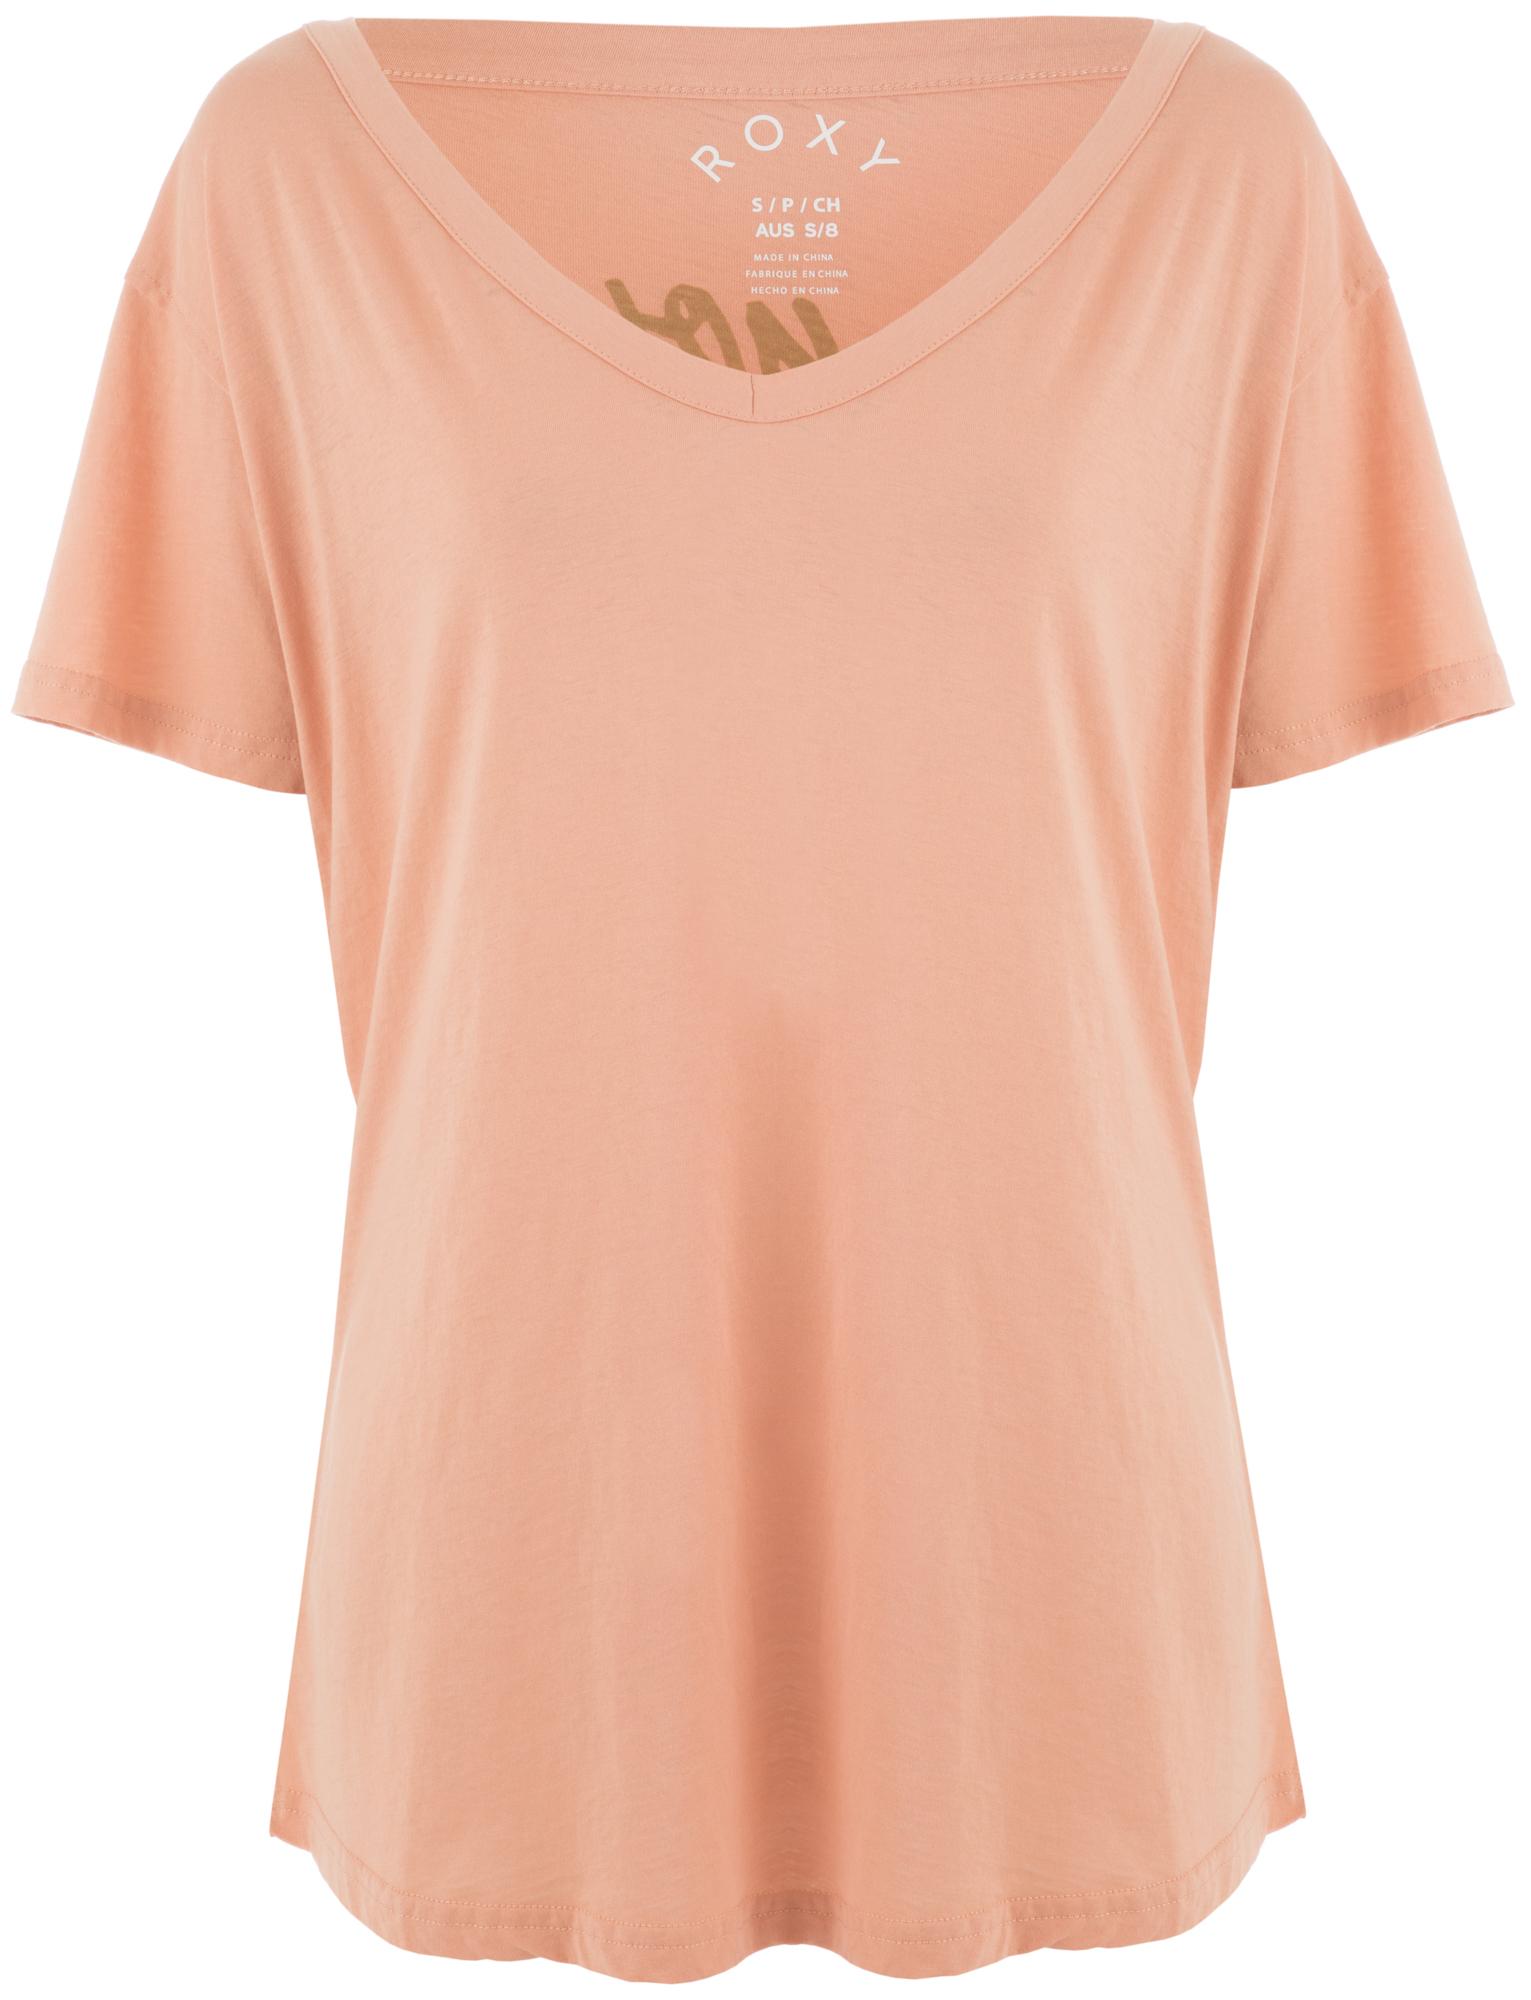 Roxy Футболка женская Roxy Great To Chill, размер 44-46 футболка детская roxy seeyouagainanch dress blues